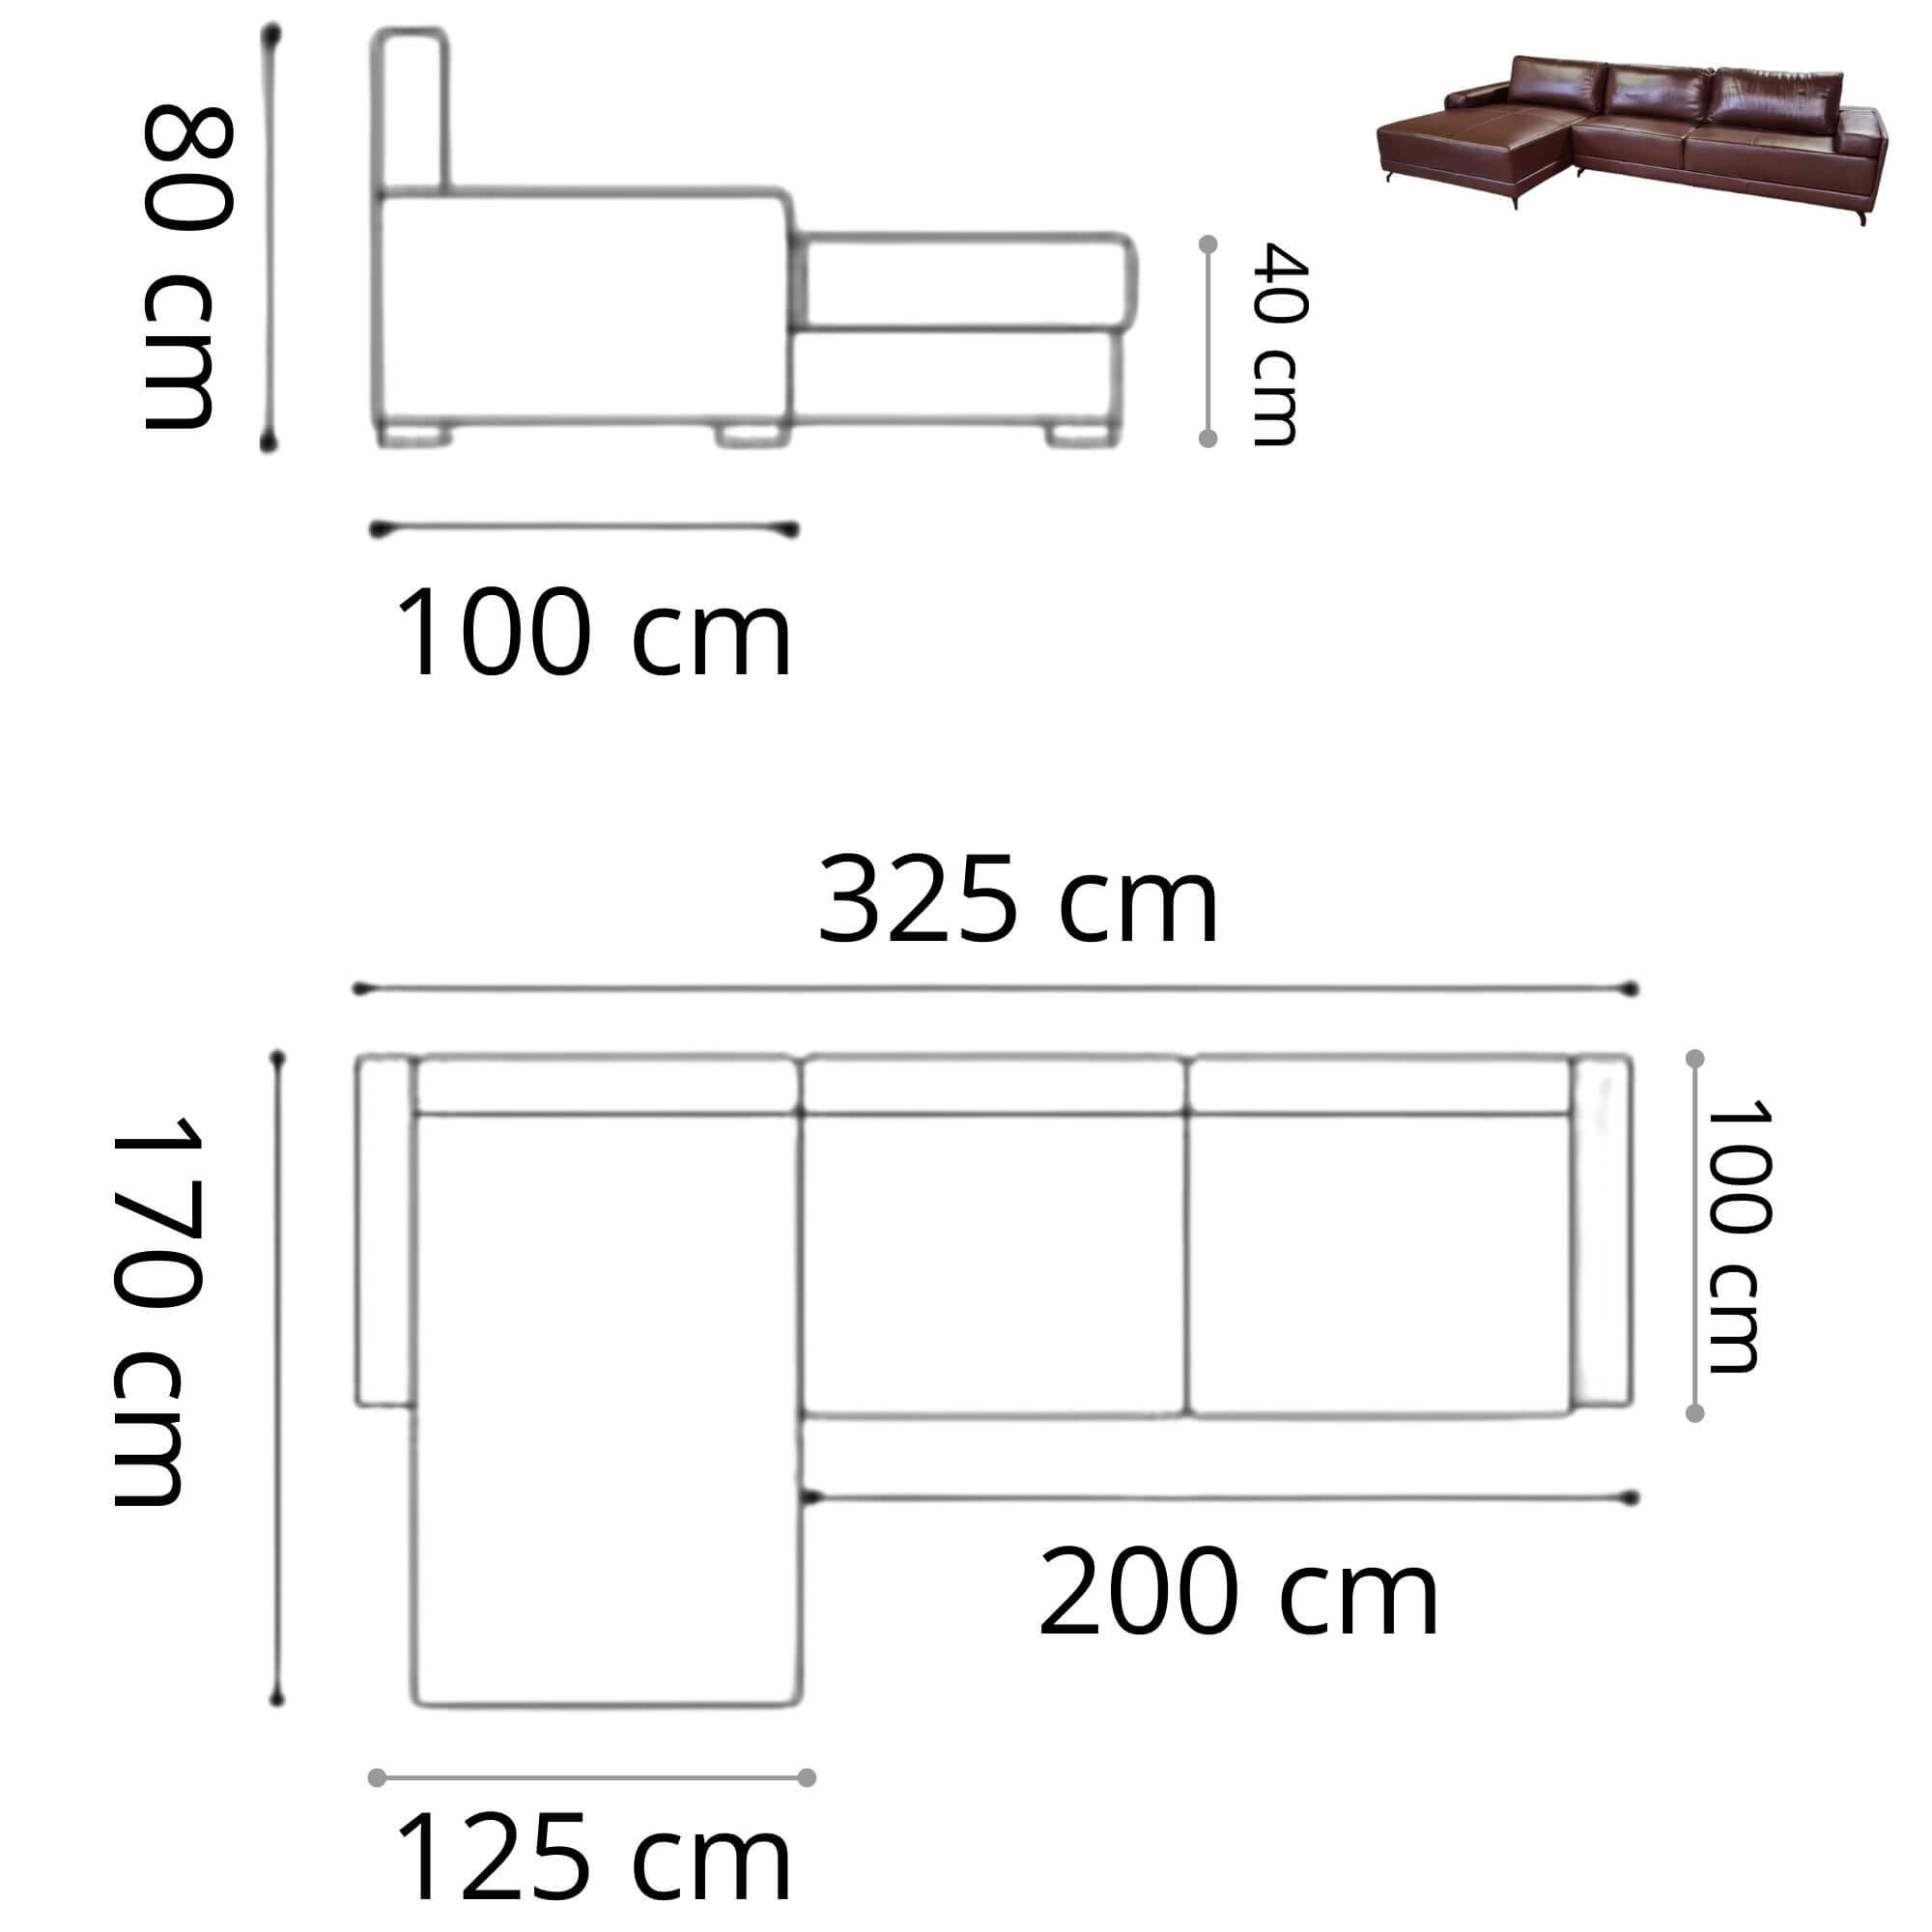 Sofá Chaise de Couro 3 Lugares 325cm Rotterdam - Caramelo LD